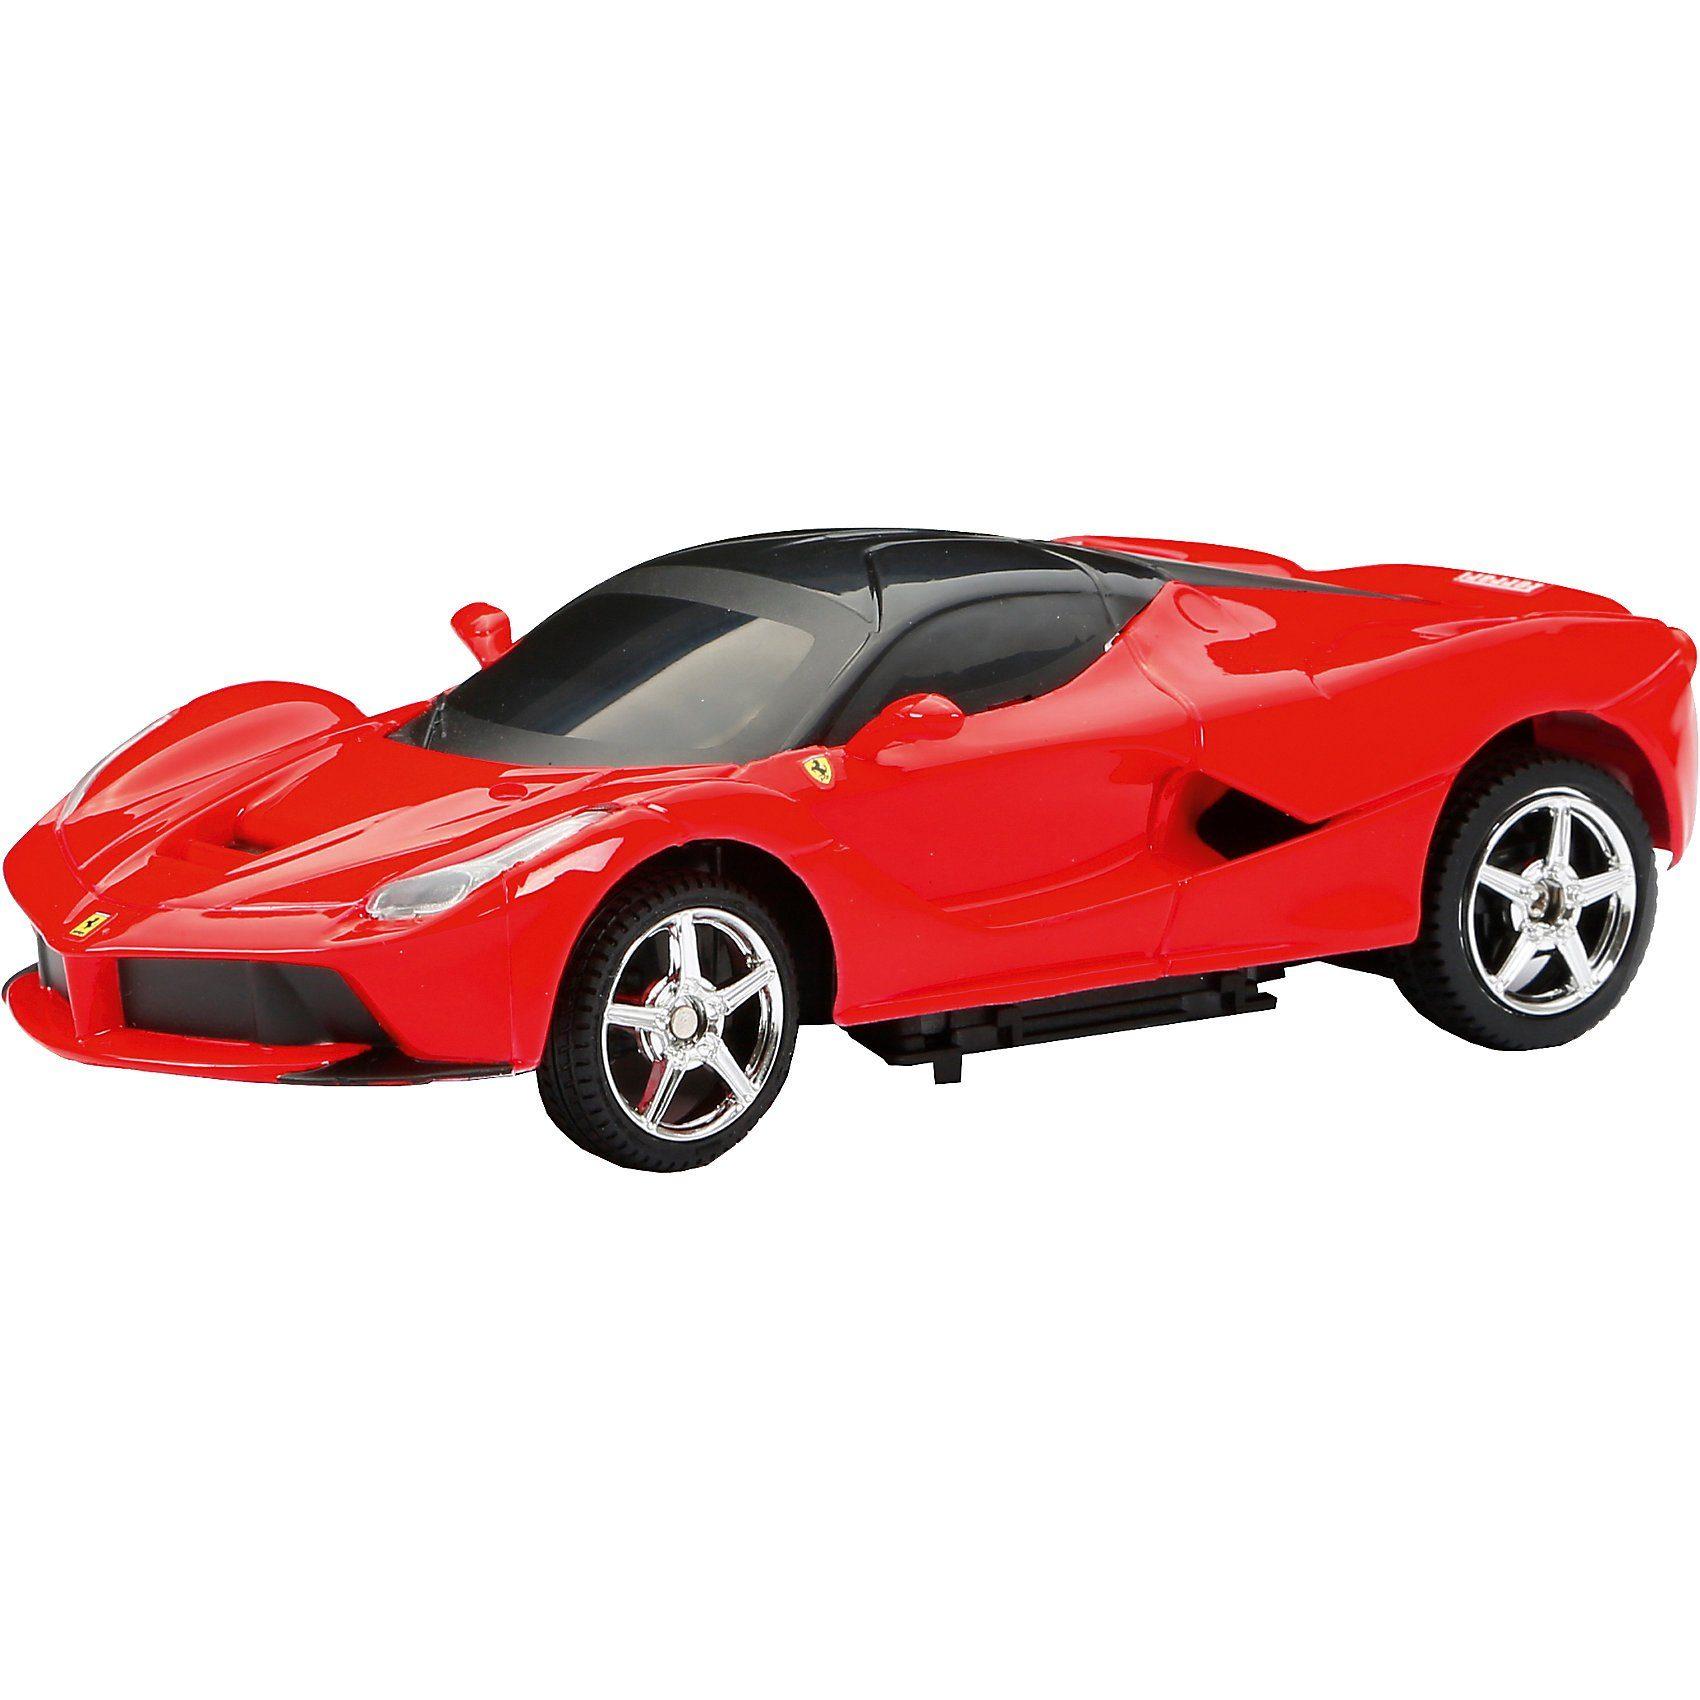 New Bright RC Fahrzeug La Ferrari 1:24